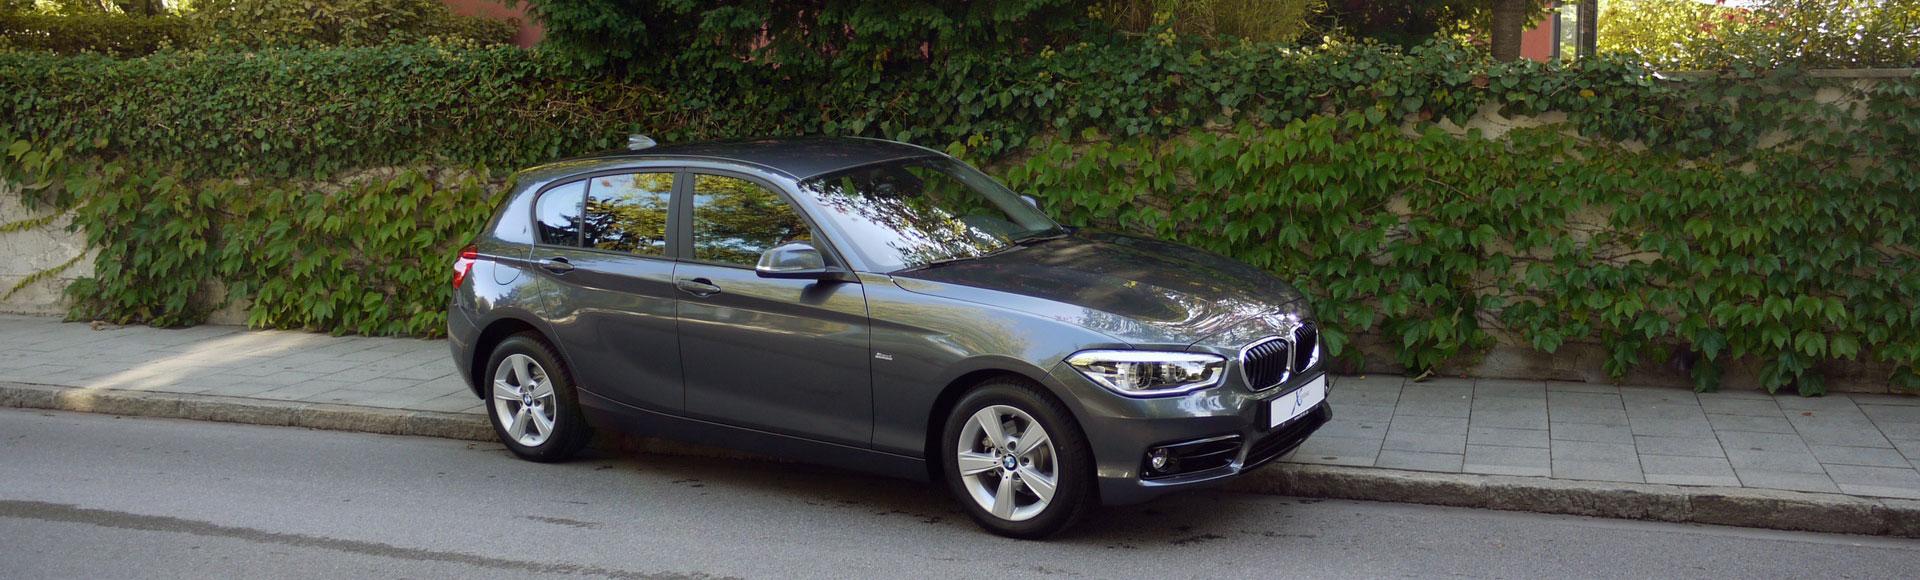 BMW 118i 2015 Sommer 124